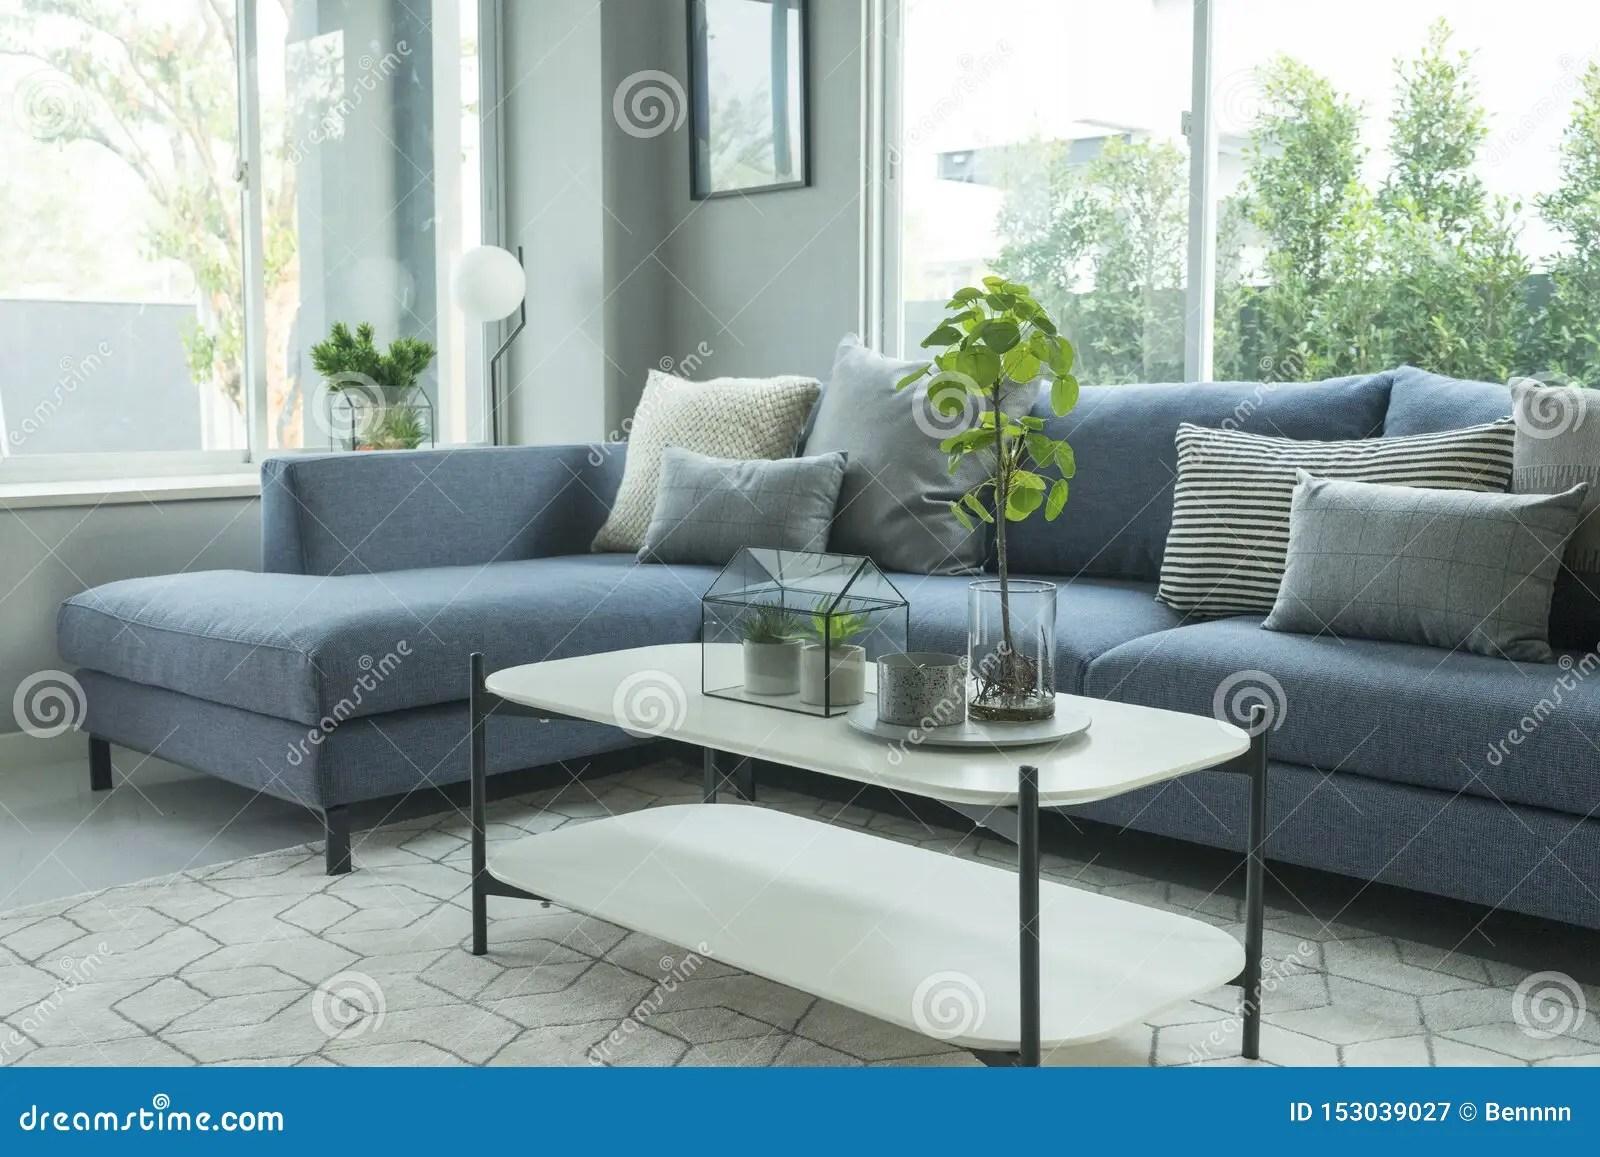 https www dreamstime com modern stylish living room blue sofa grey pillow coffee table floor lamp image153039027